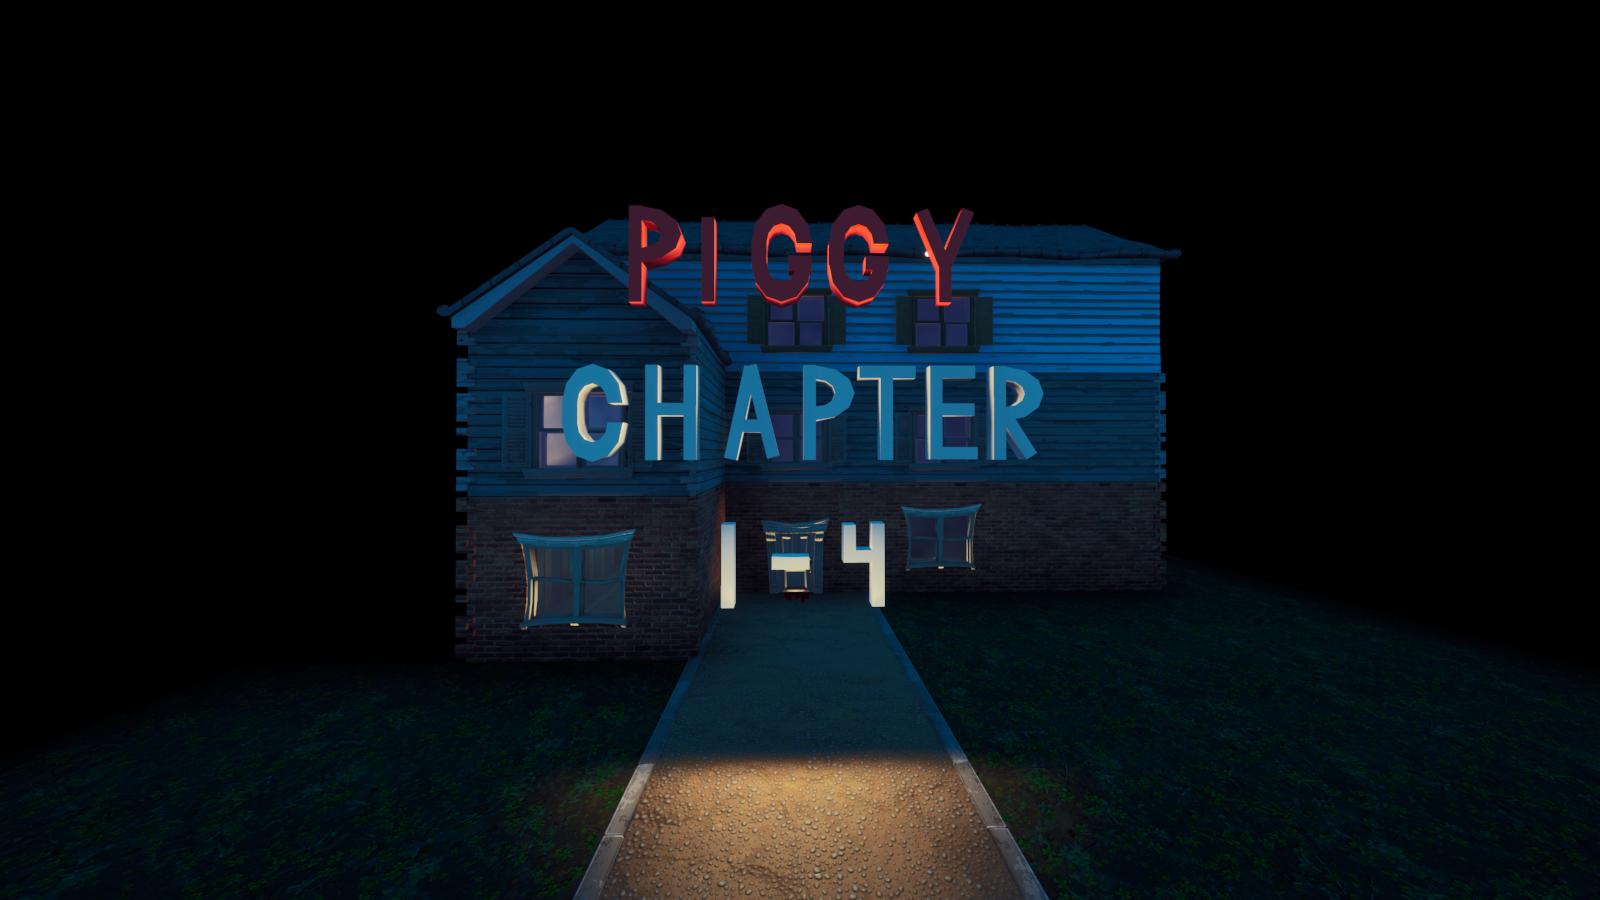 Piggy Chapter 1-4 + PLAYER MODE! 8840-5689-4557 by xavieplayz